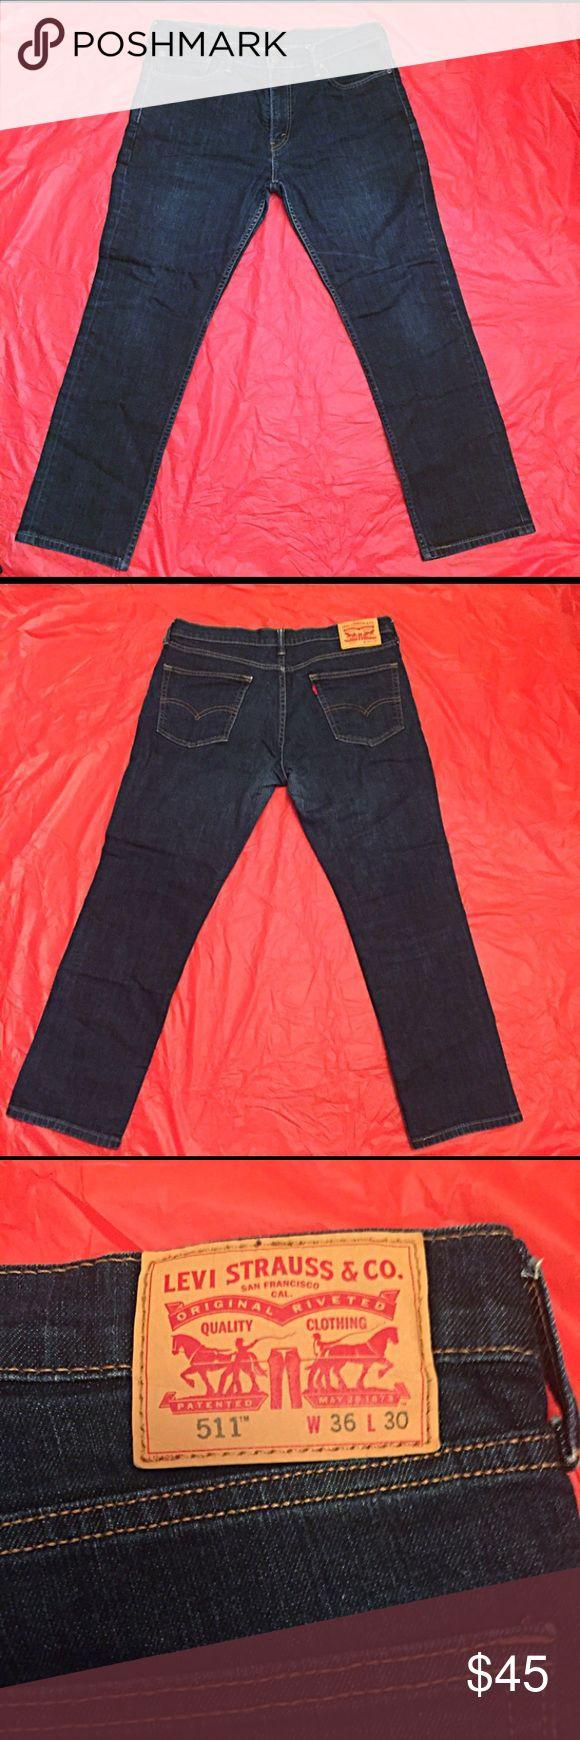 Mens Levi 511 Slim Fit Jeans Mens Levi 511 Slim Fit Jeans  Waist 36 Length 30 Levi's Jeans Slim